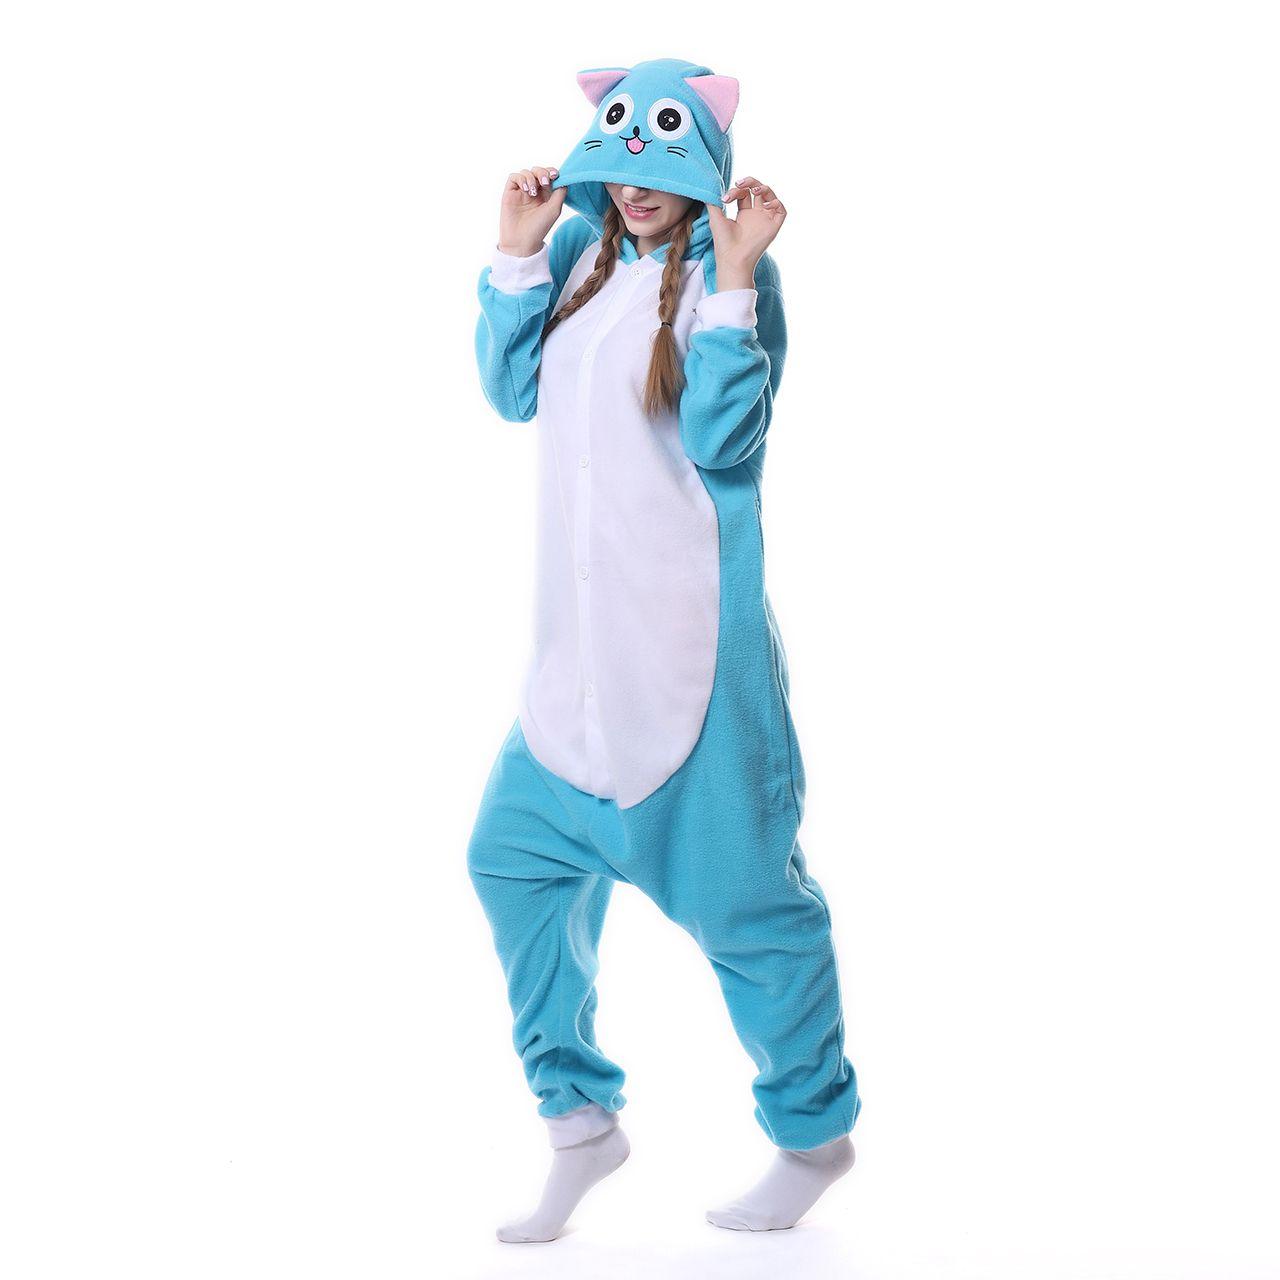 Adult Cosplay Anime Cartoon Onesie Pajamas kigurumi Halloween Costumes Sleepwear Happy Habib Cat